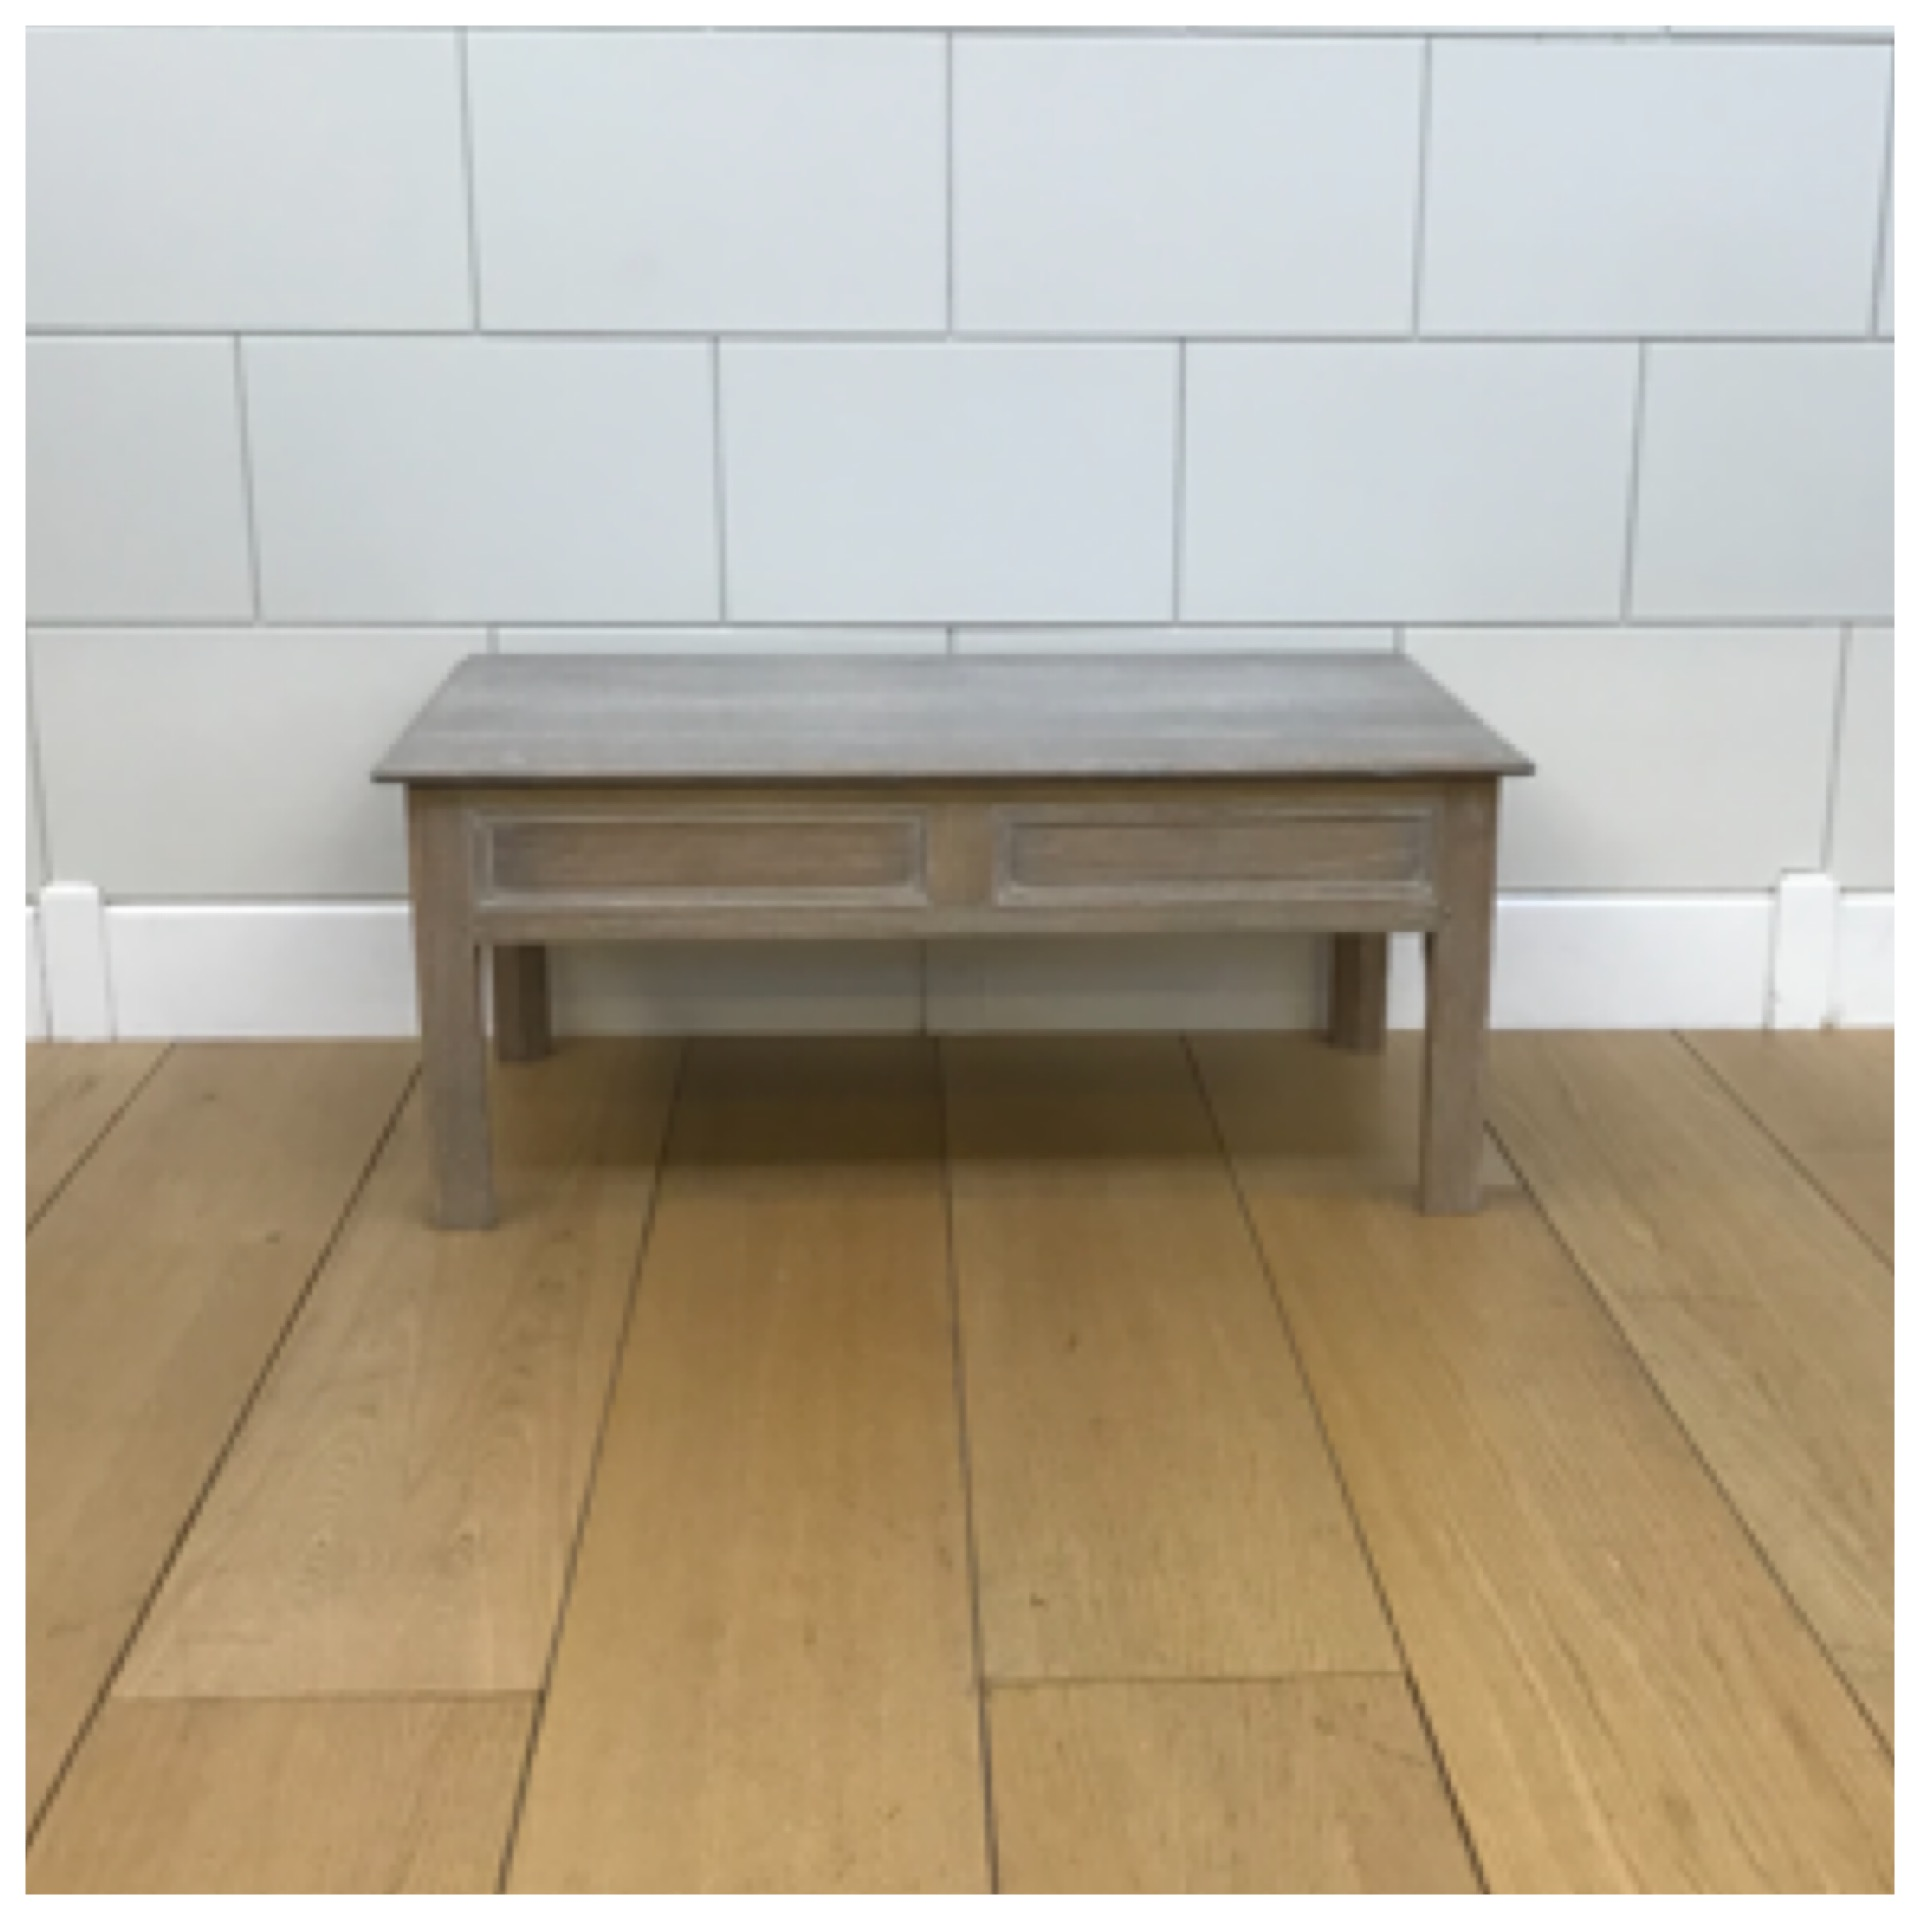 Sale Price: £120